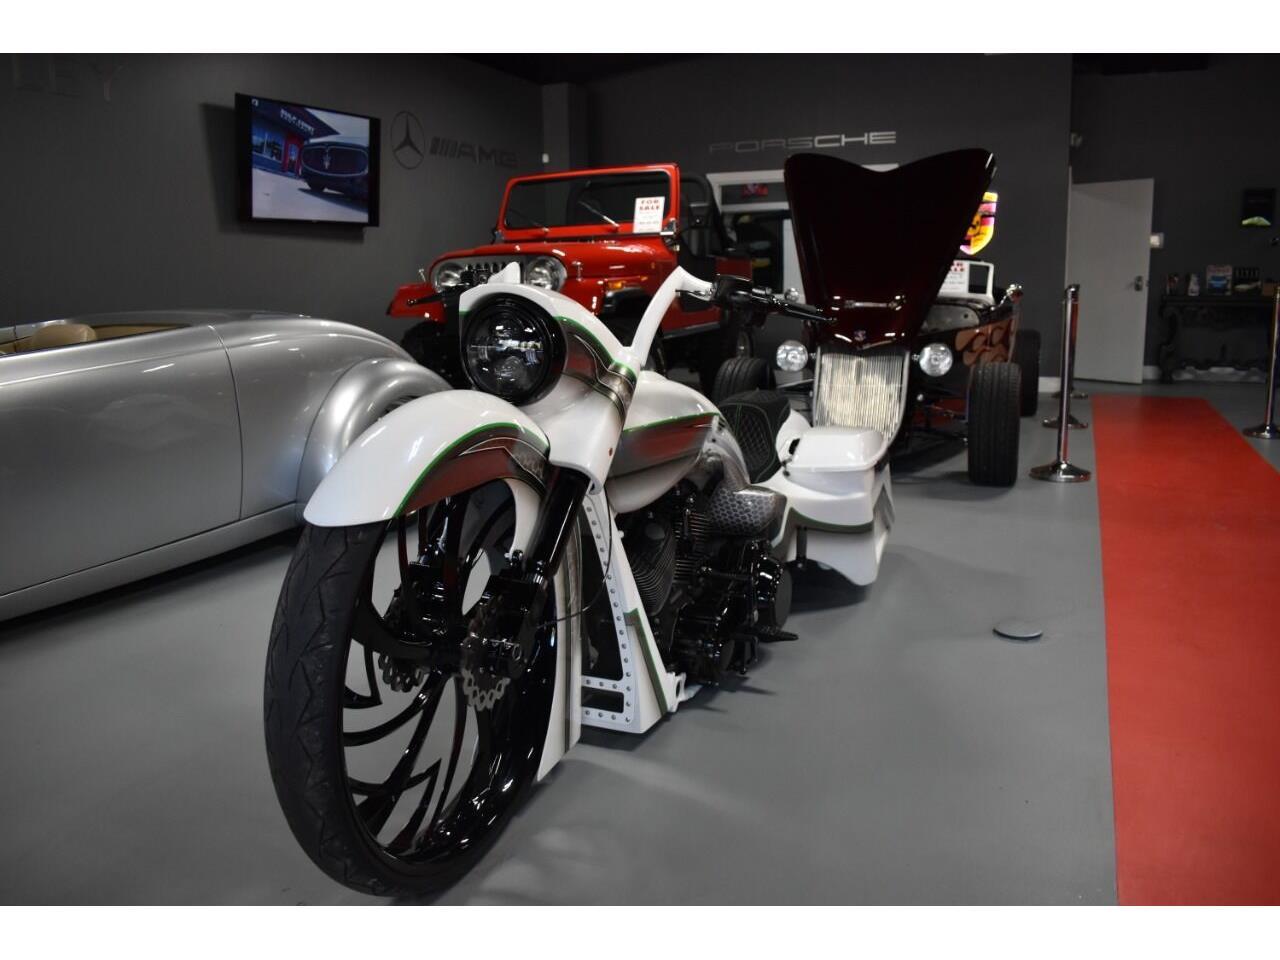 2014 Harley-Davidson Motorcycle